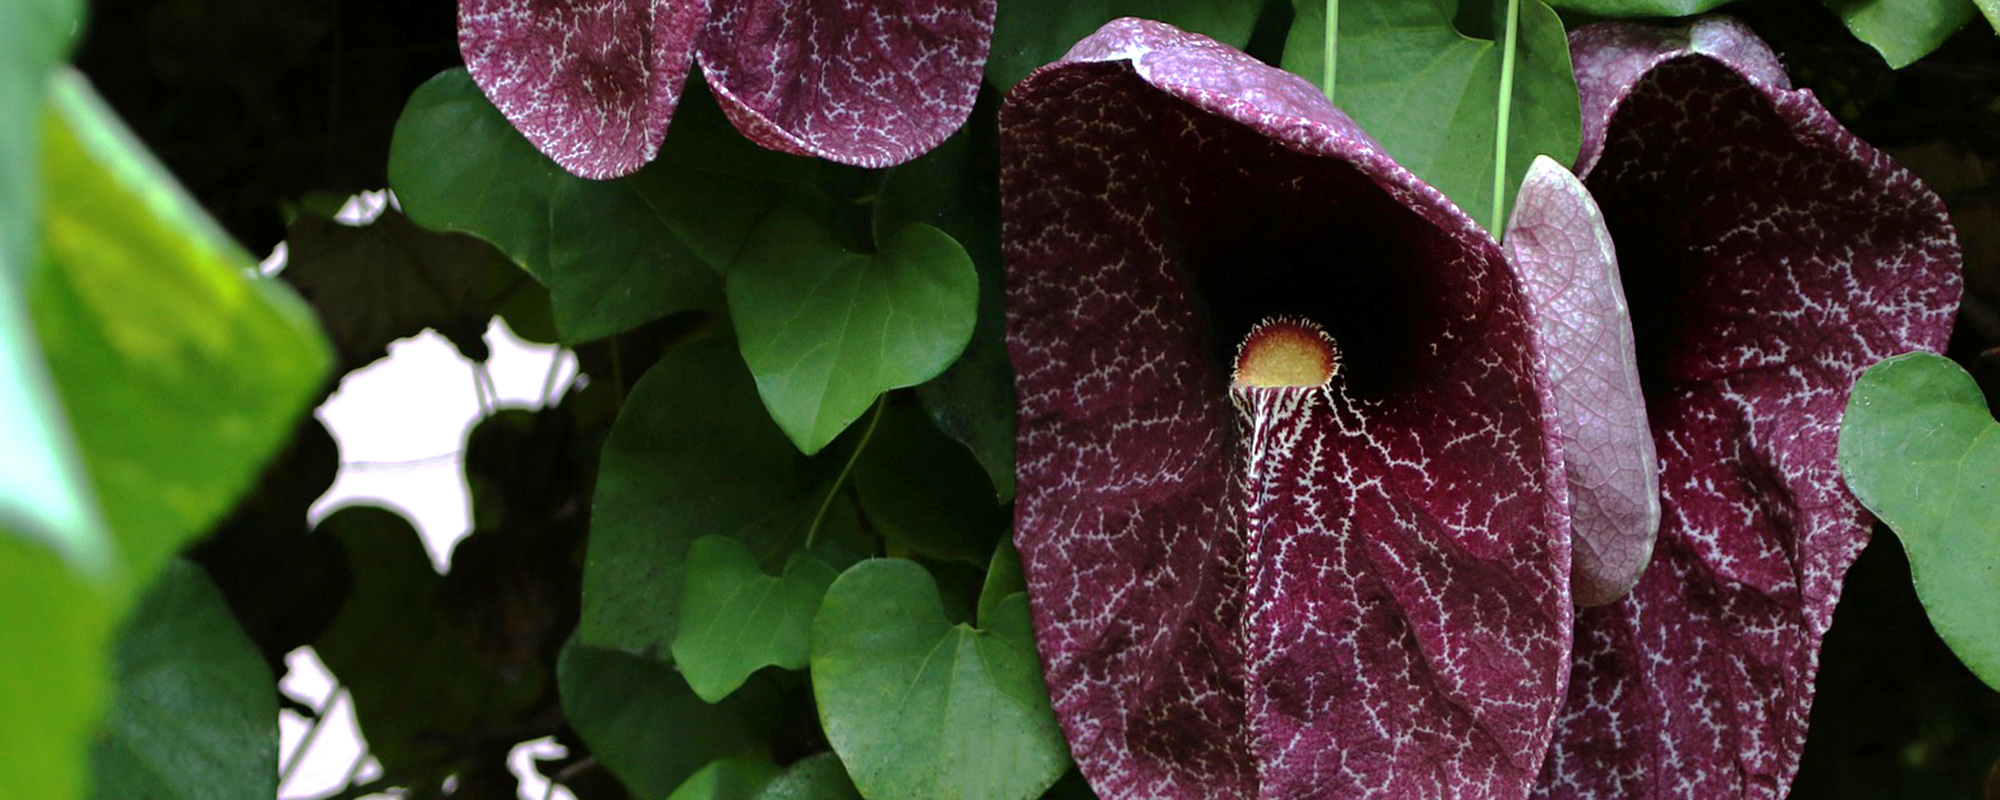 Pfeifenblumen Detail